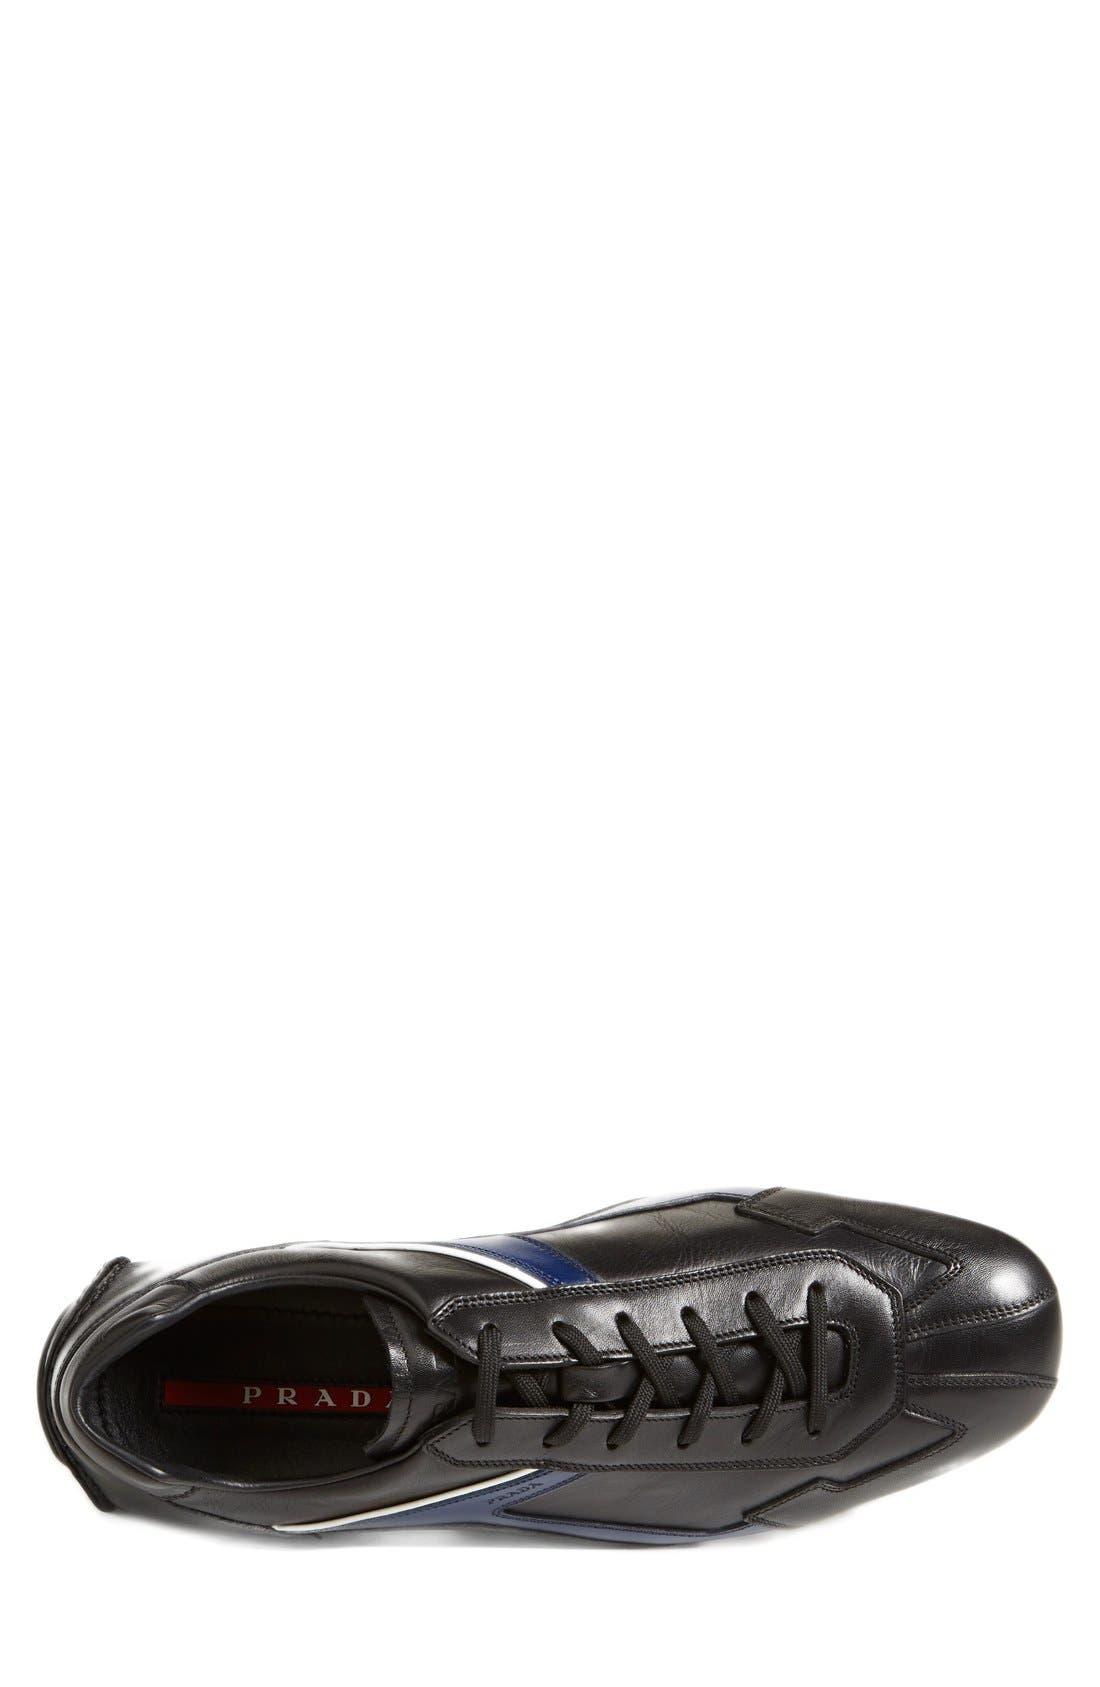 'Monte Carlo' Sneaker,                             Alternate thumbnail 3, color,                             001